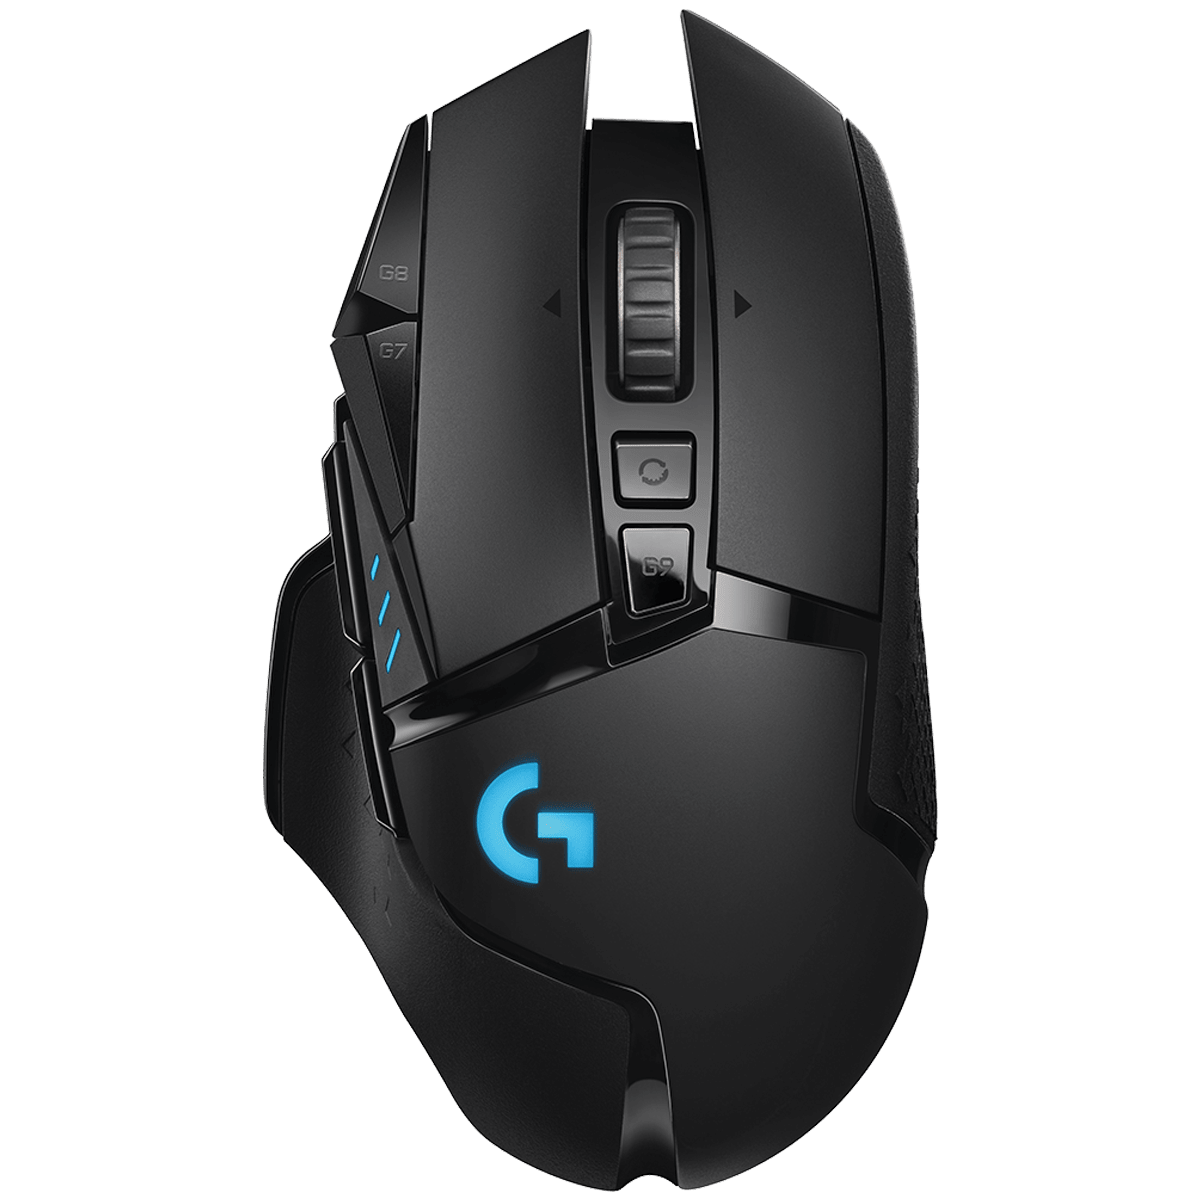 Logitech G502 Lightspeed Wireless Mouse (Lightsync RGB Lighting, 910-005569, Black)